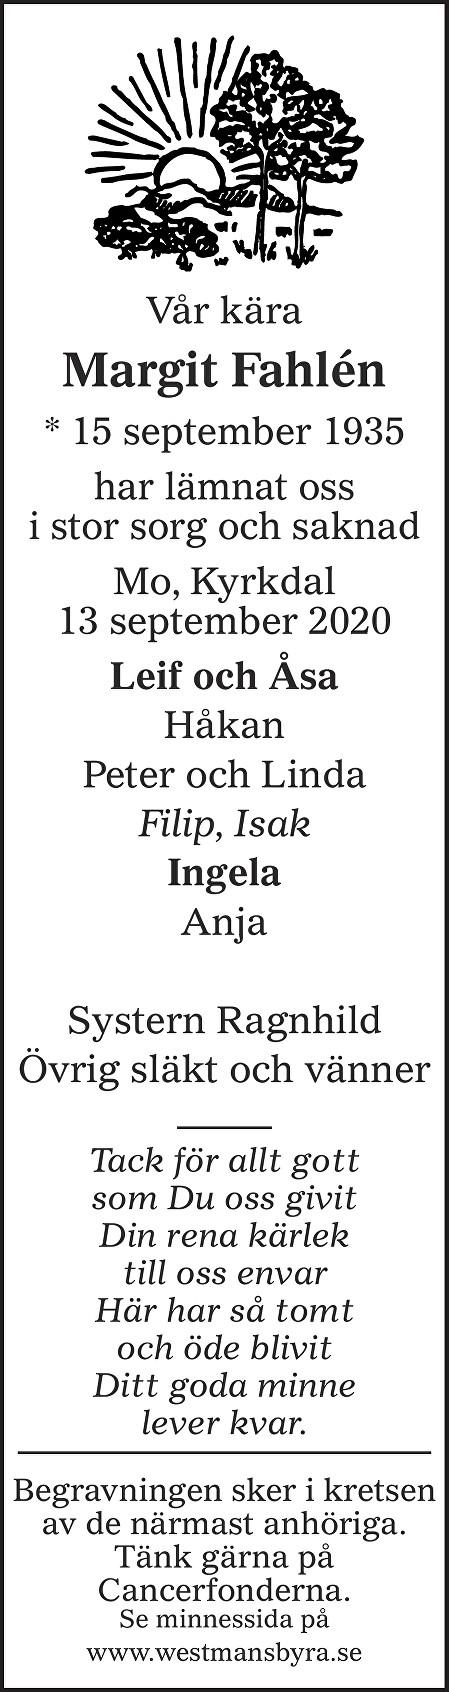 Margit Fahlén Death notice